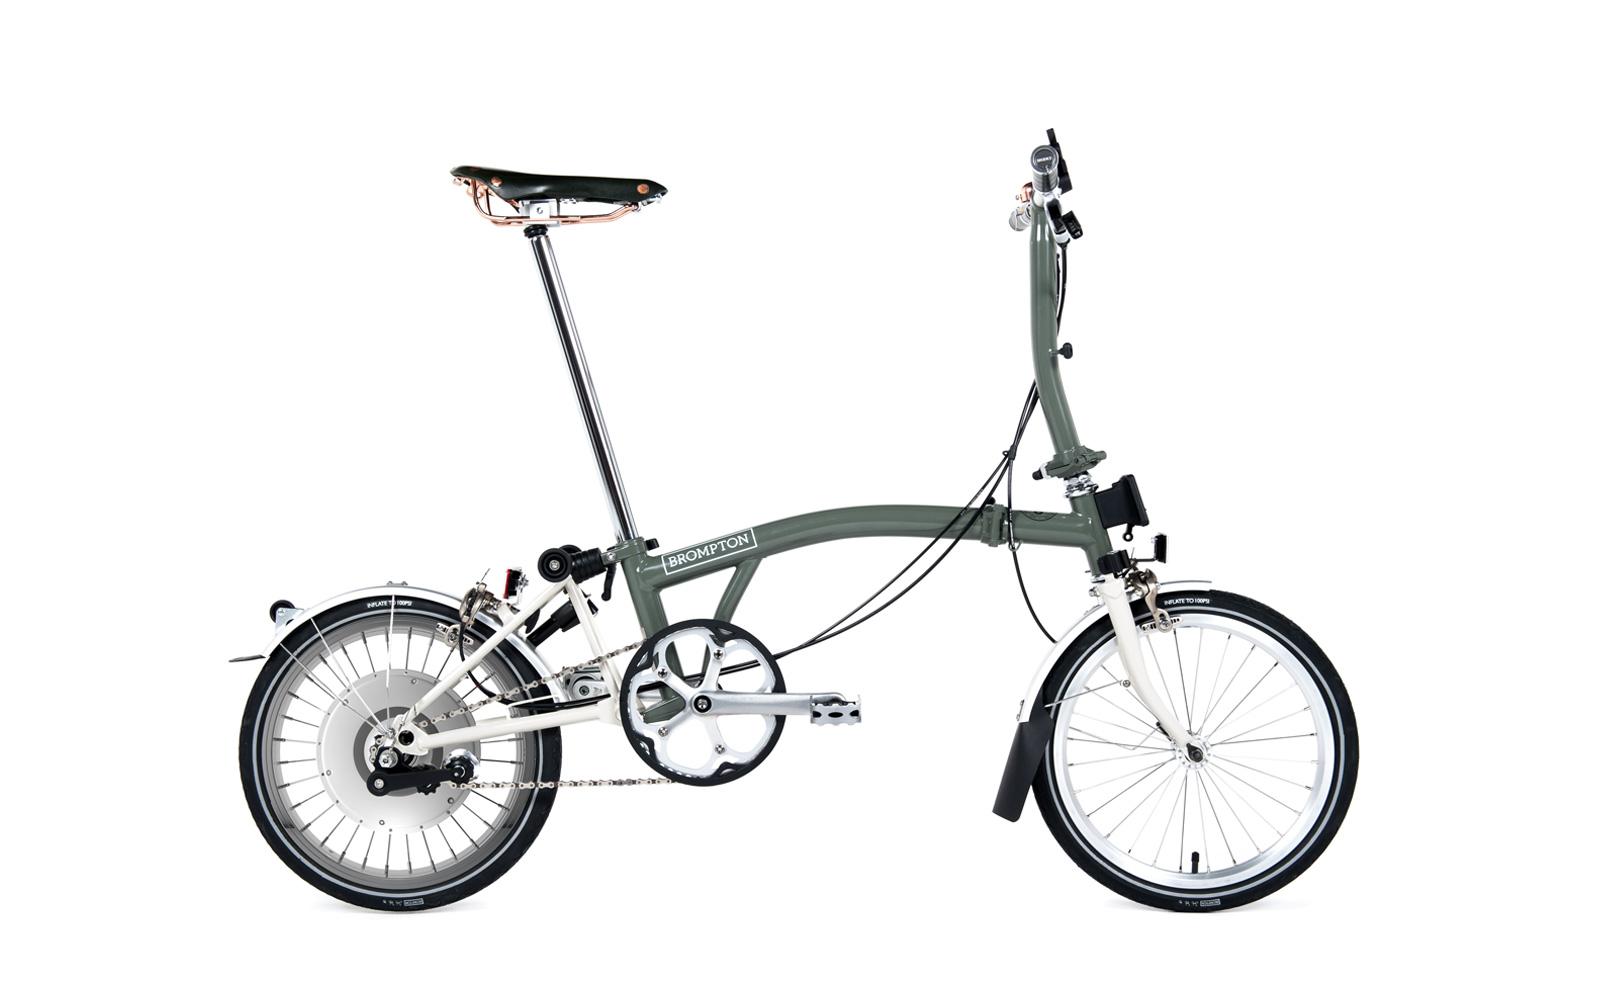 The Best Brompton Electric Bike Kits In